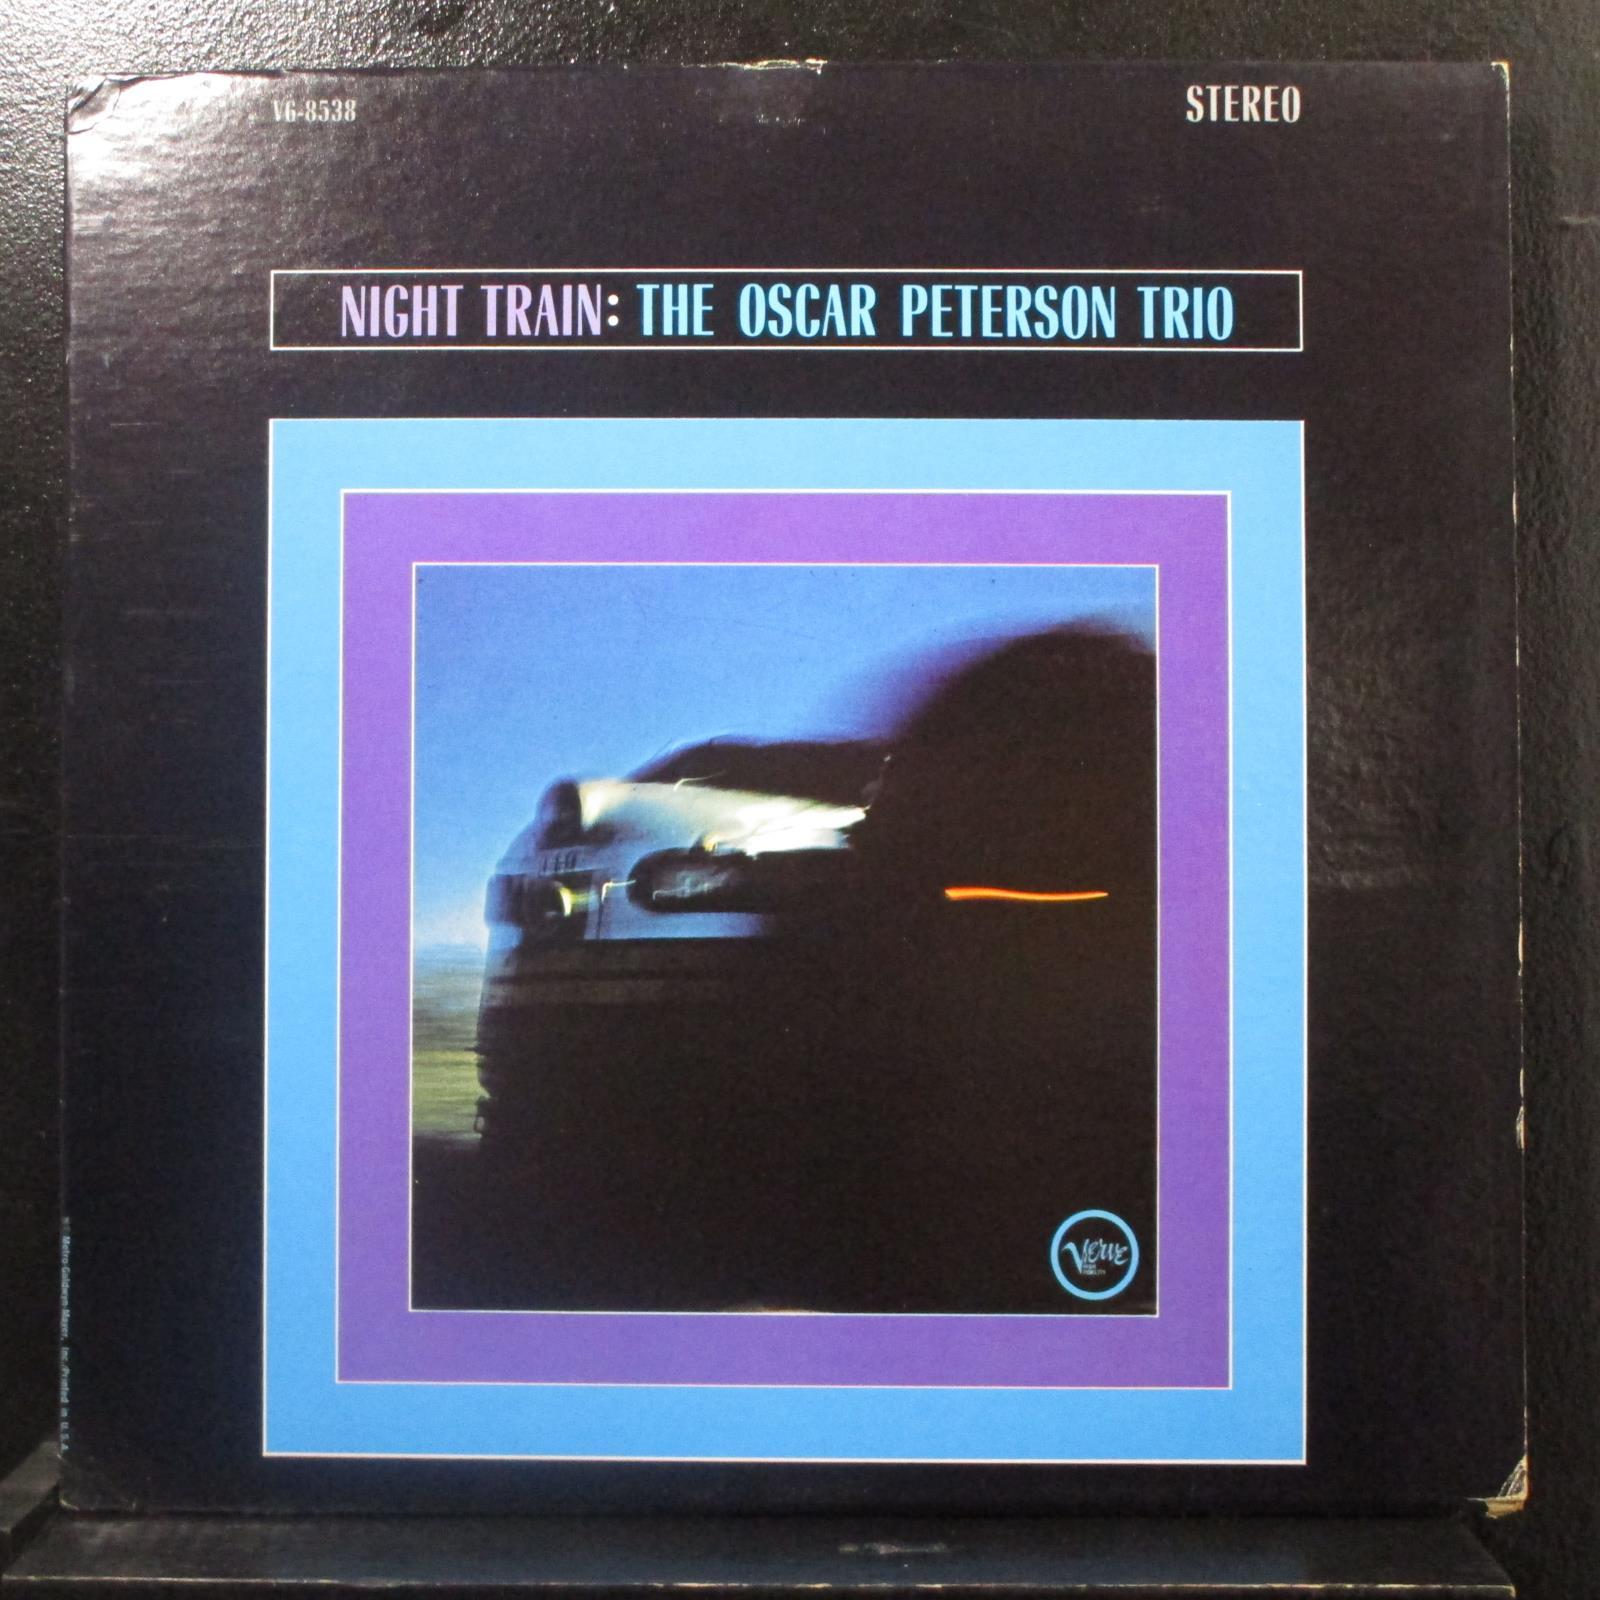 The Oscar Peterson Trio Night Train Lp Vg V6 8538 Verve